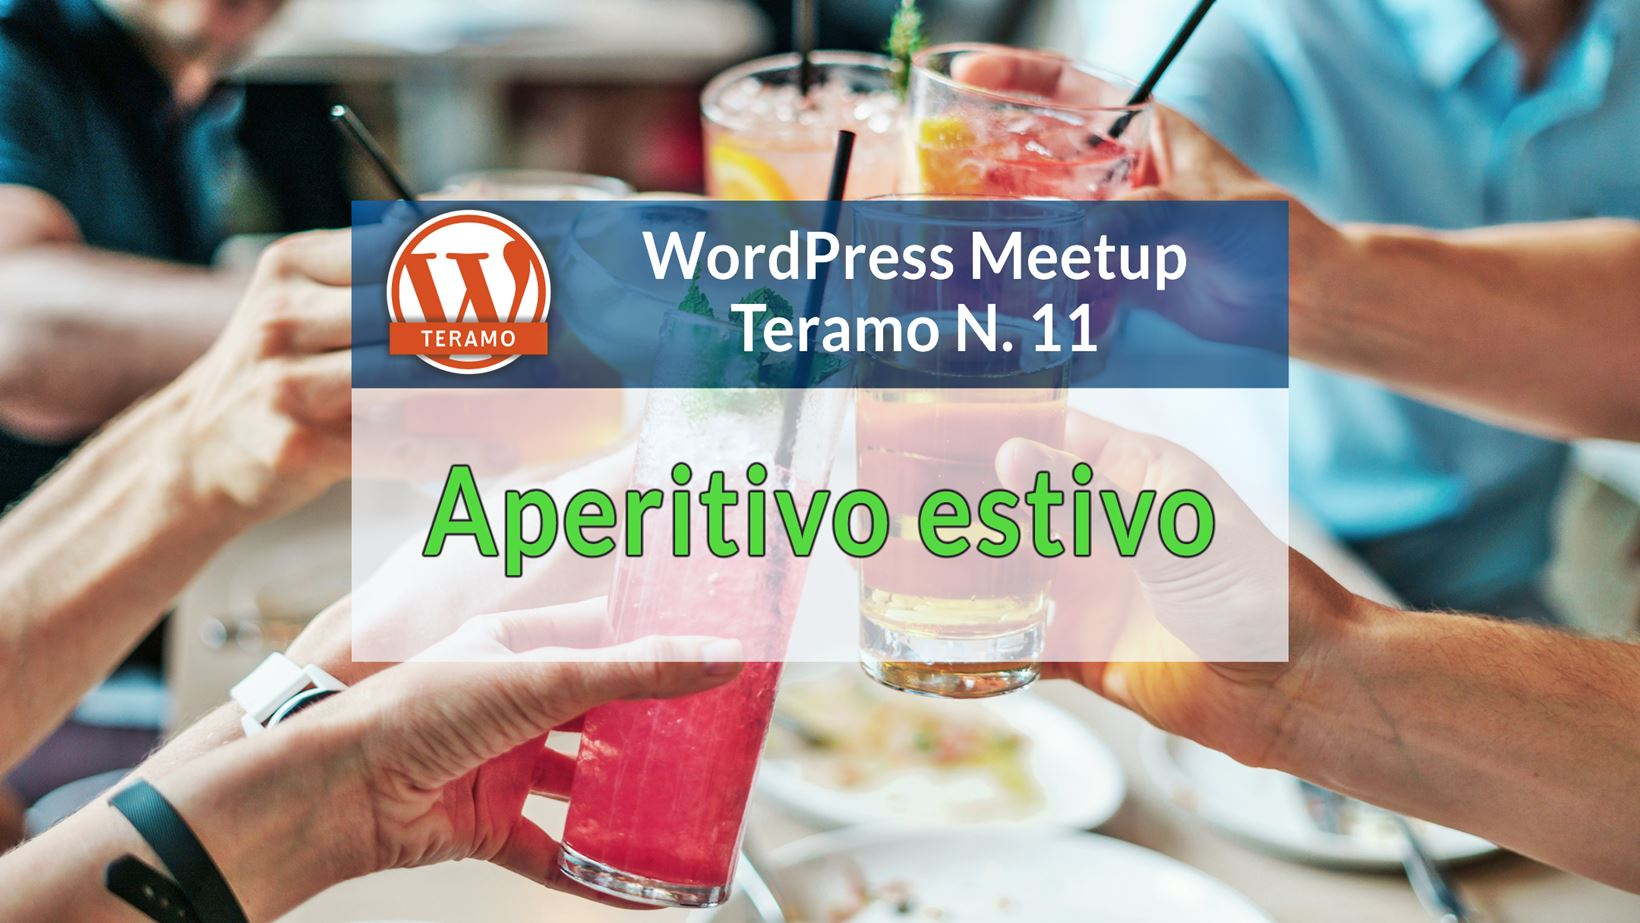 Aperitivo estivo - WordPress Meetup Teramo N. 11